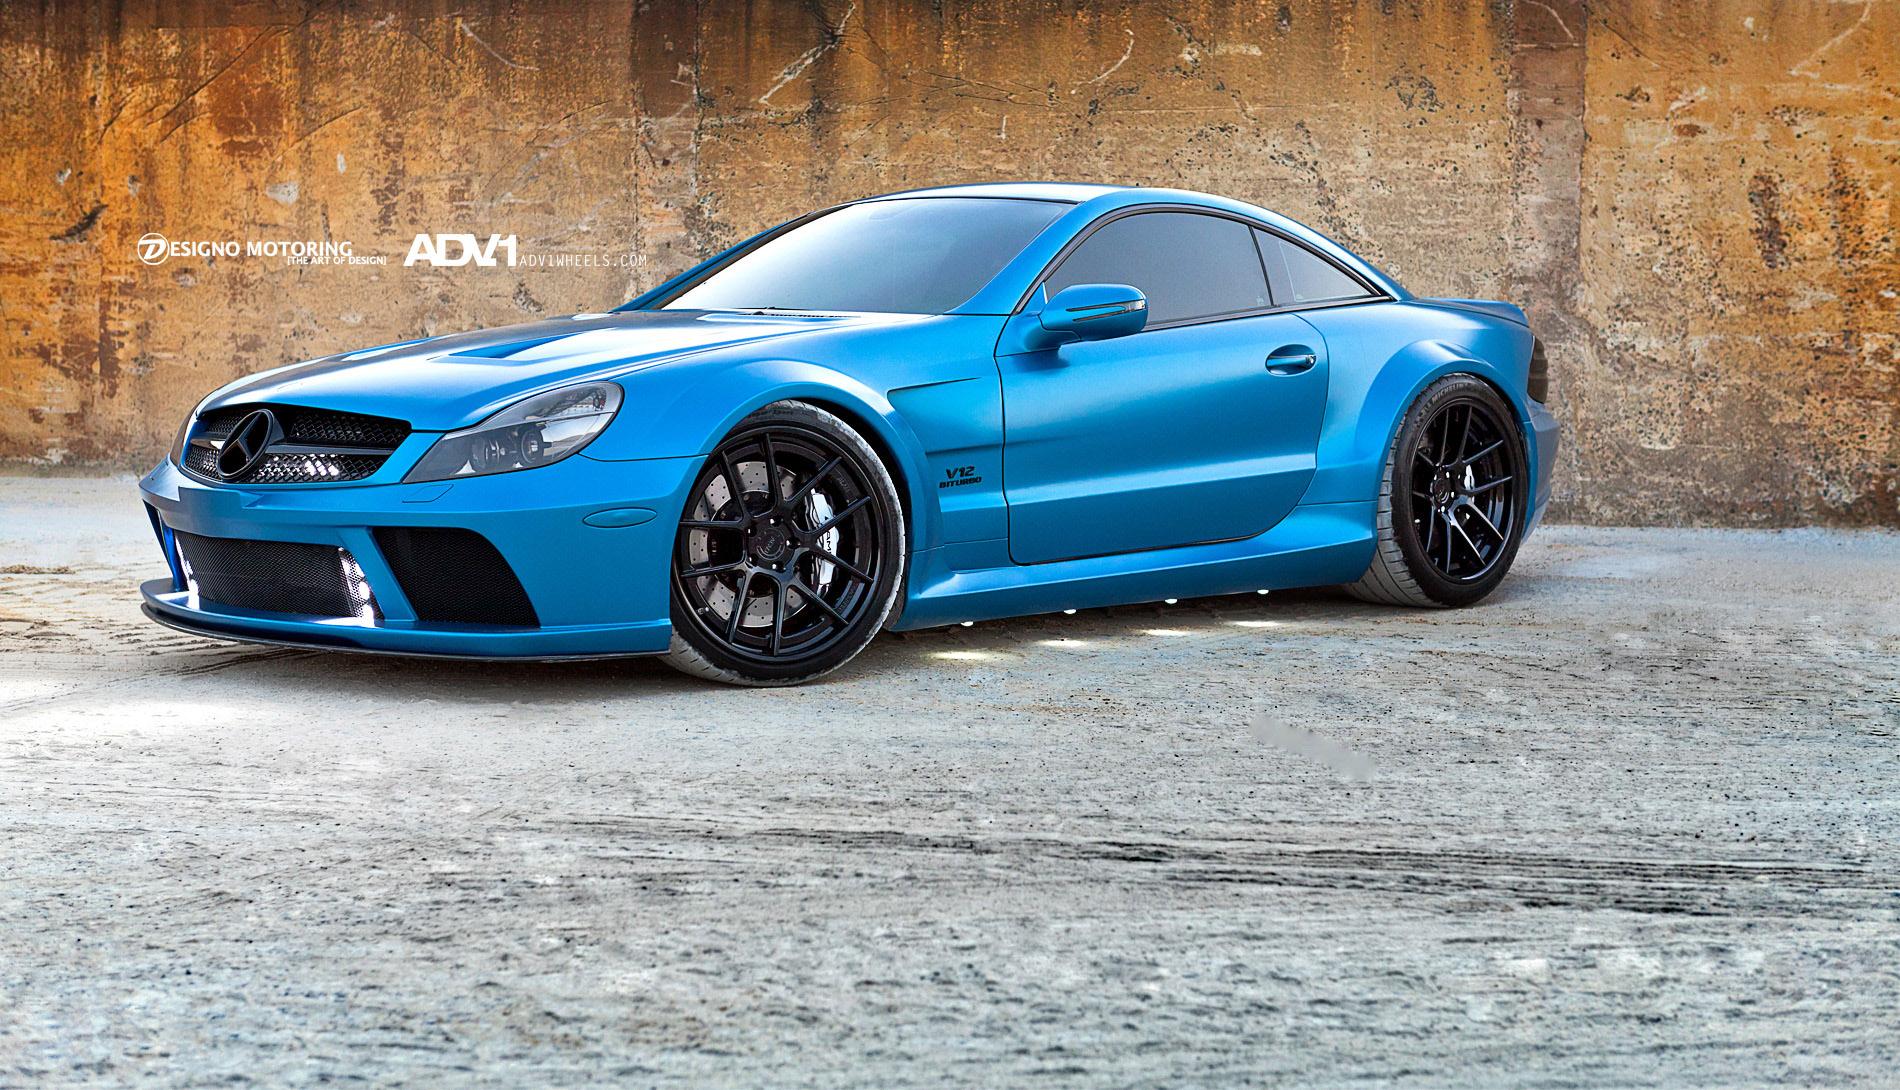 Mercedes-Benz синий гараж бесплатно